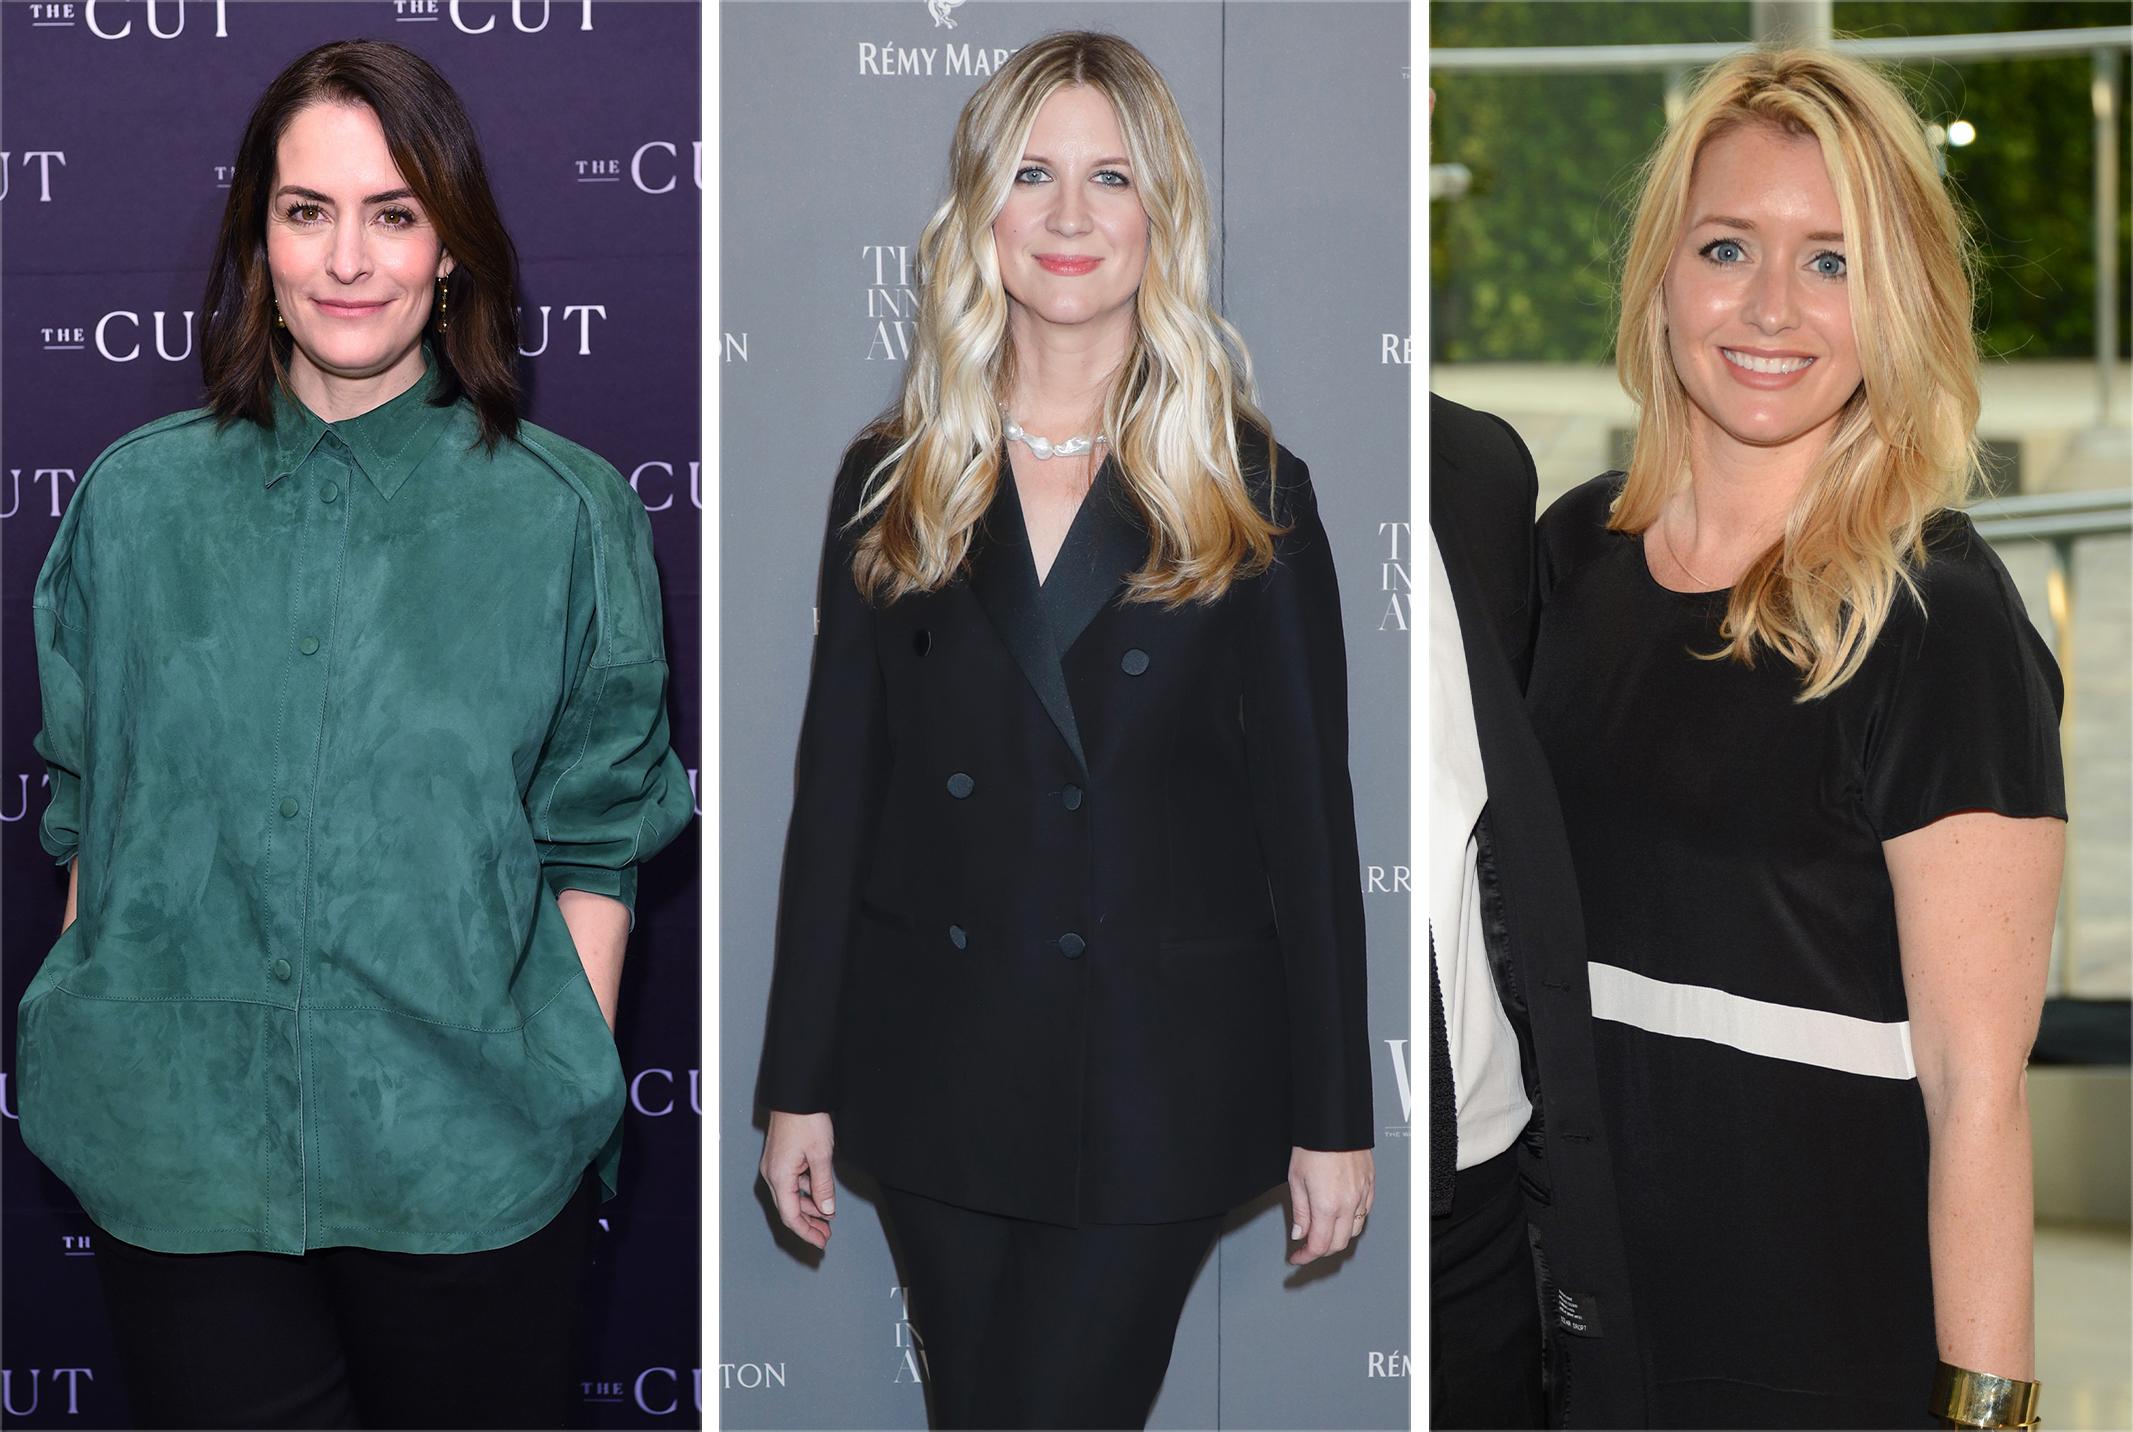 Stella Bugbee, Kristina O'Neill and Joyann King.